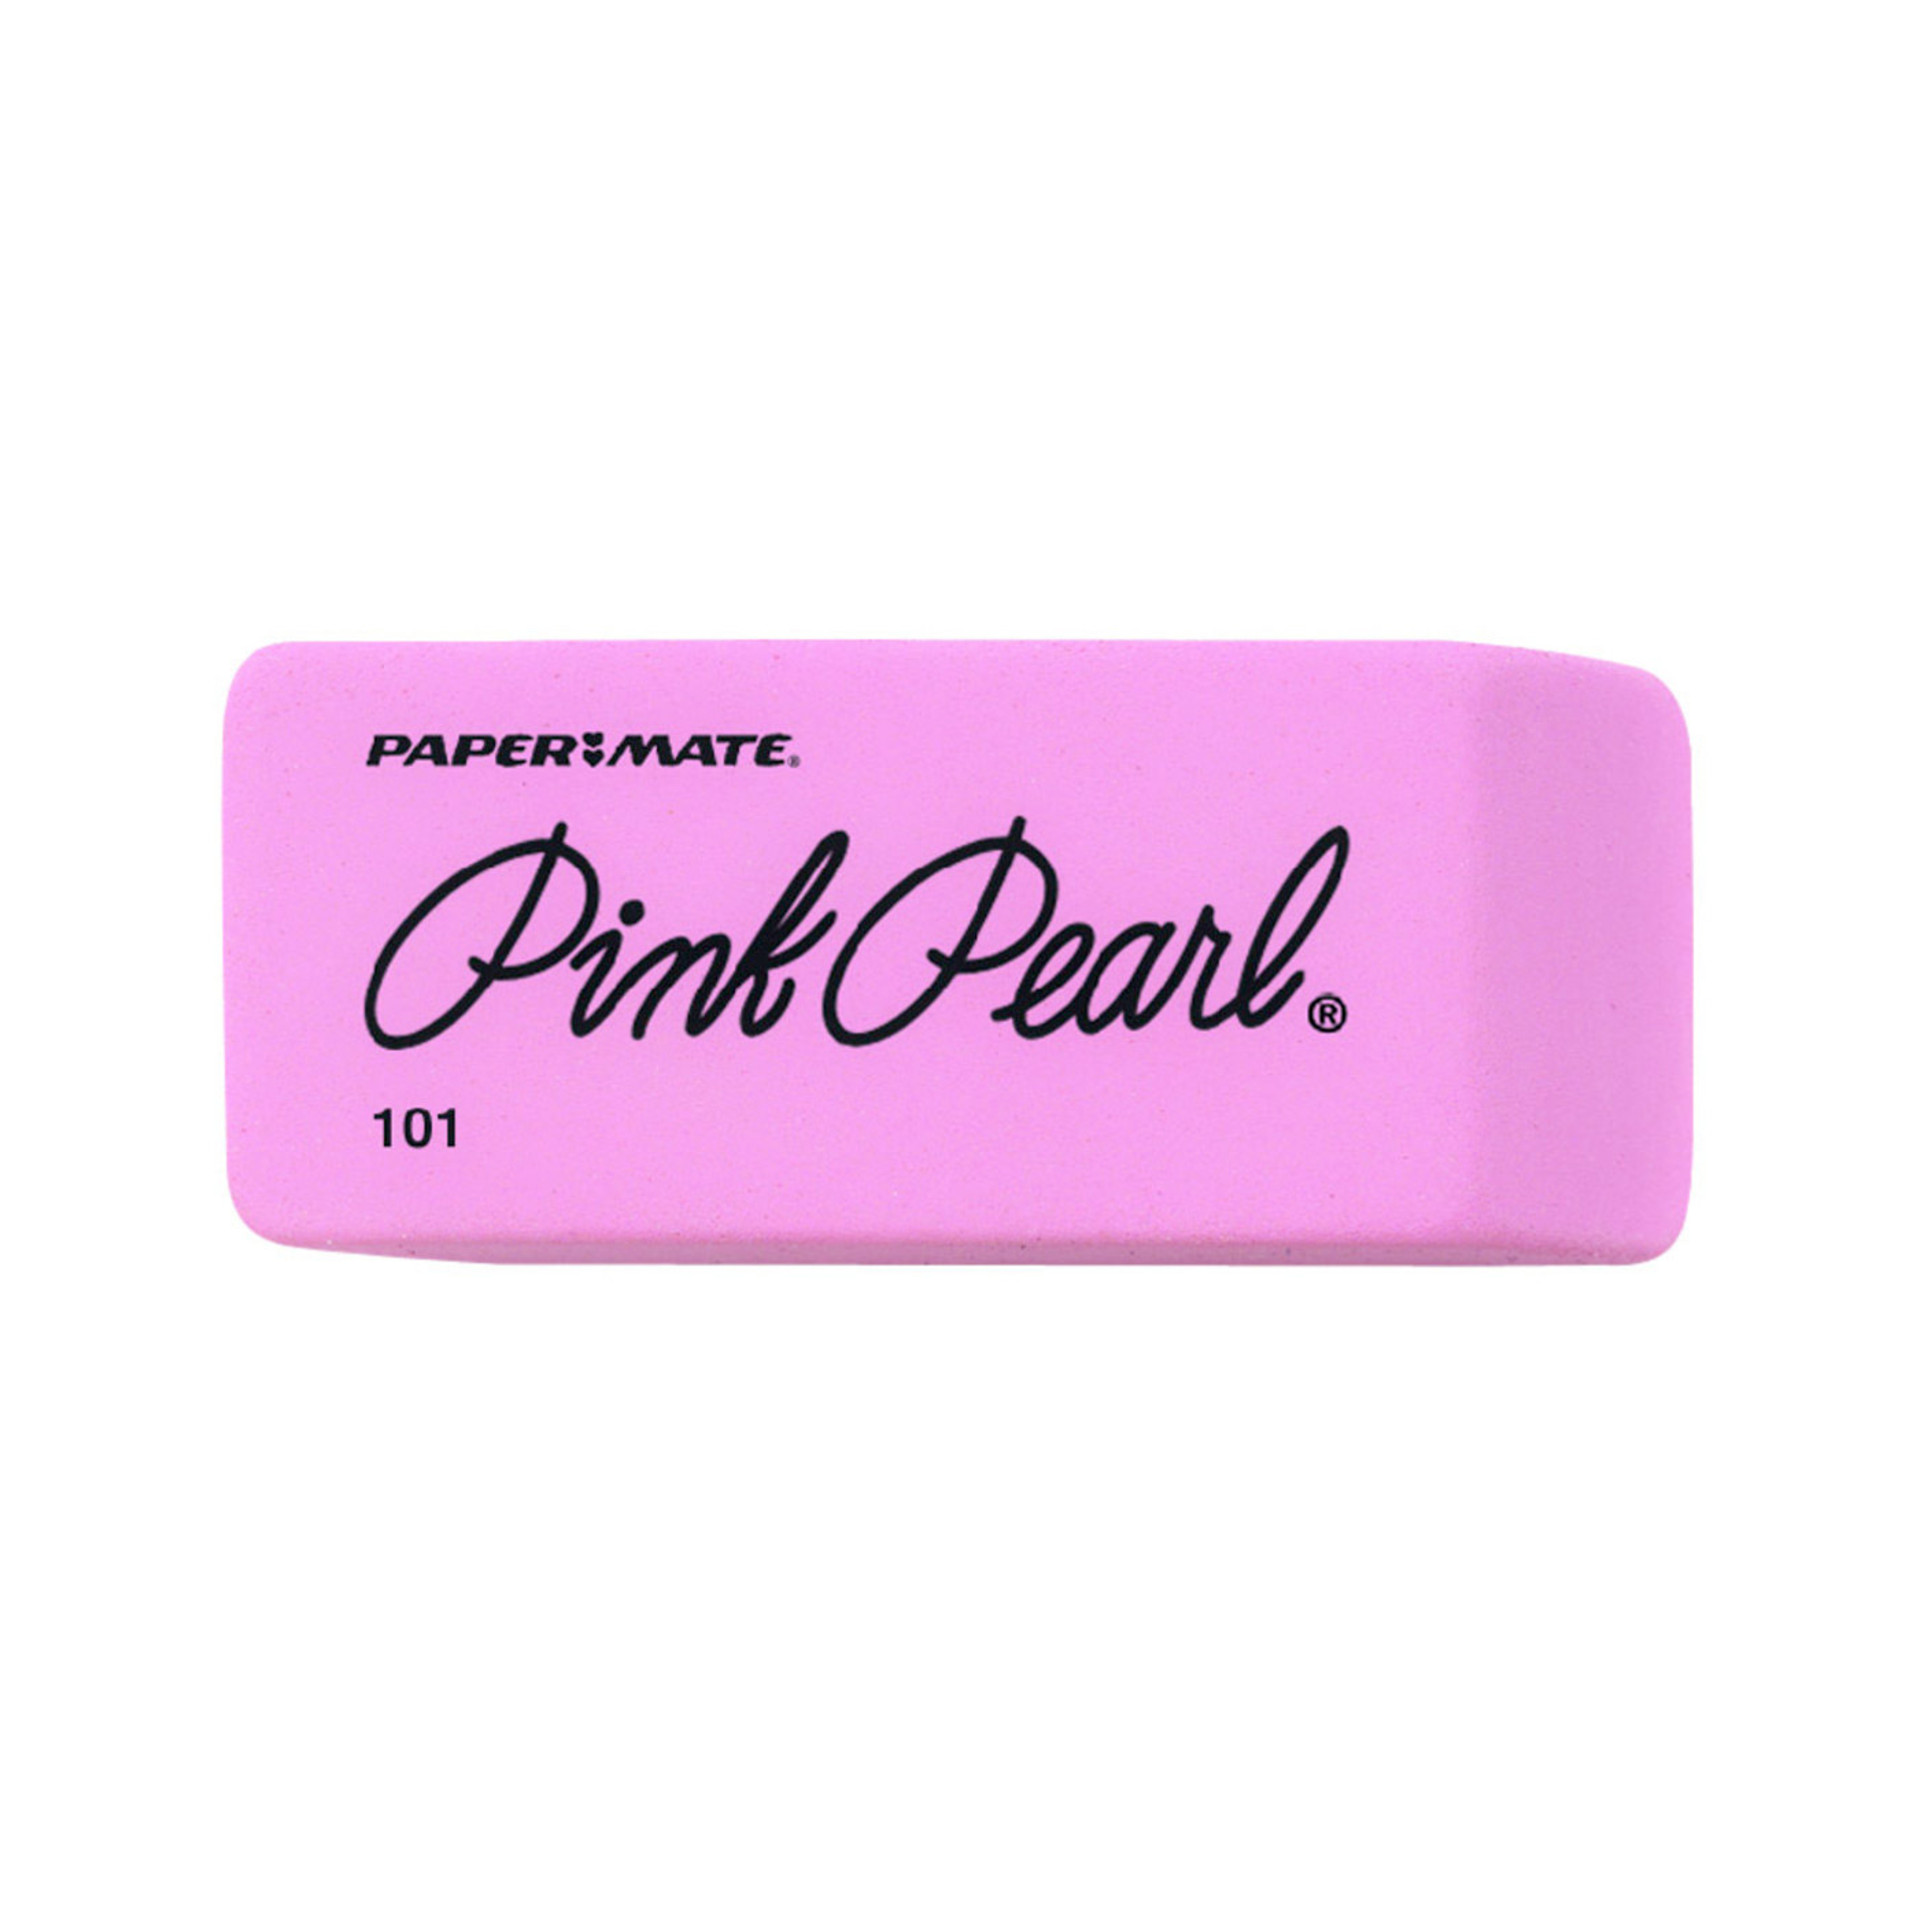 Paper Mate Pink Pearl Rubber Eraser